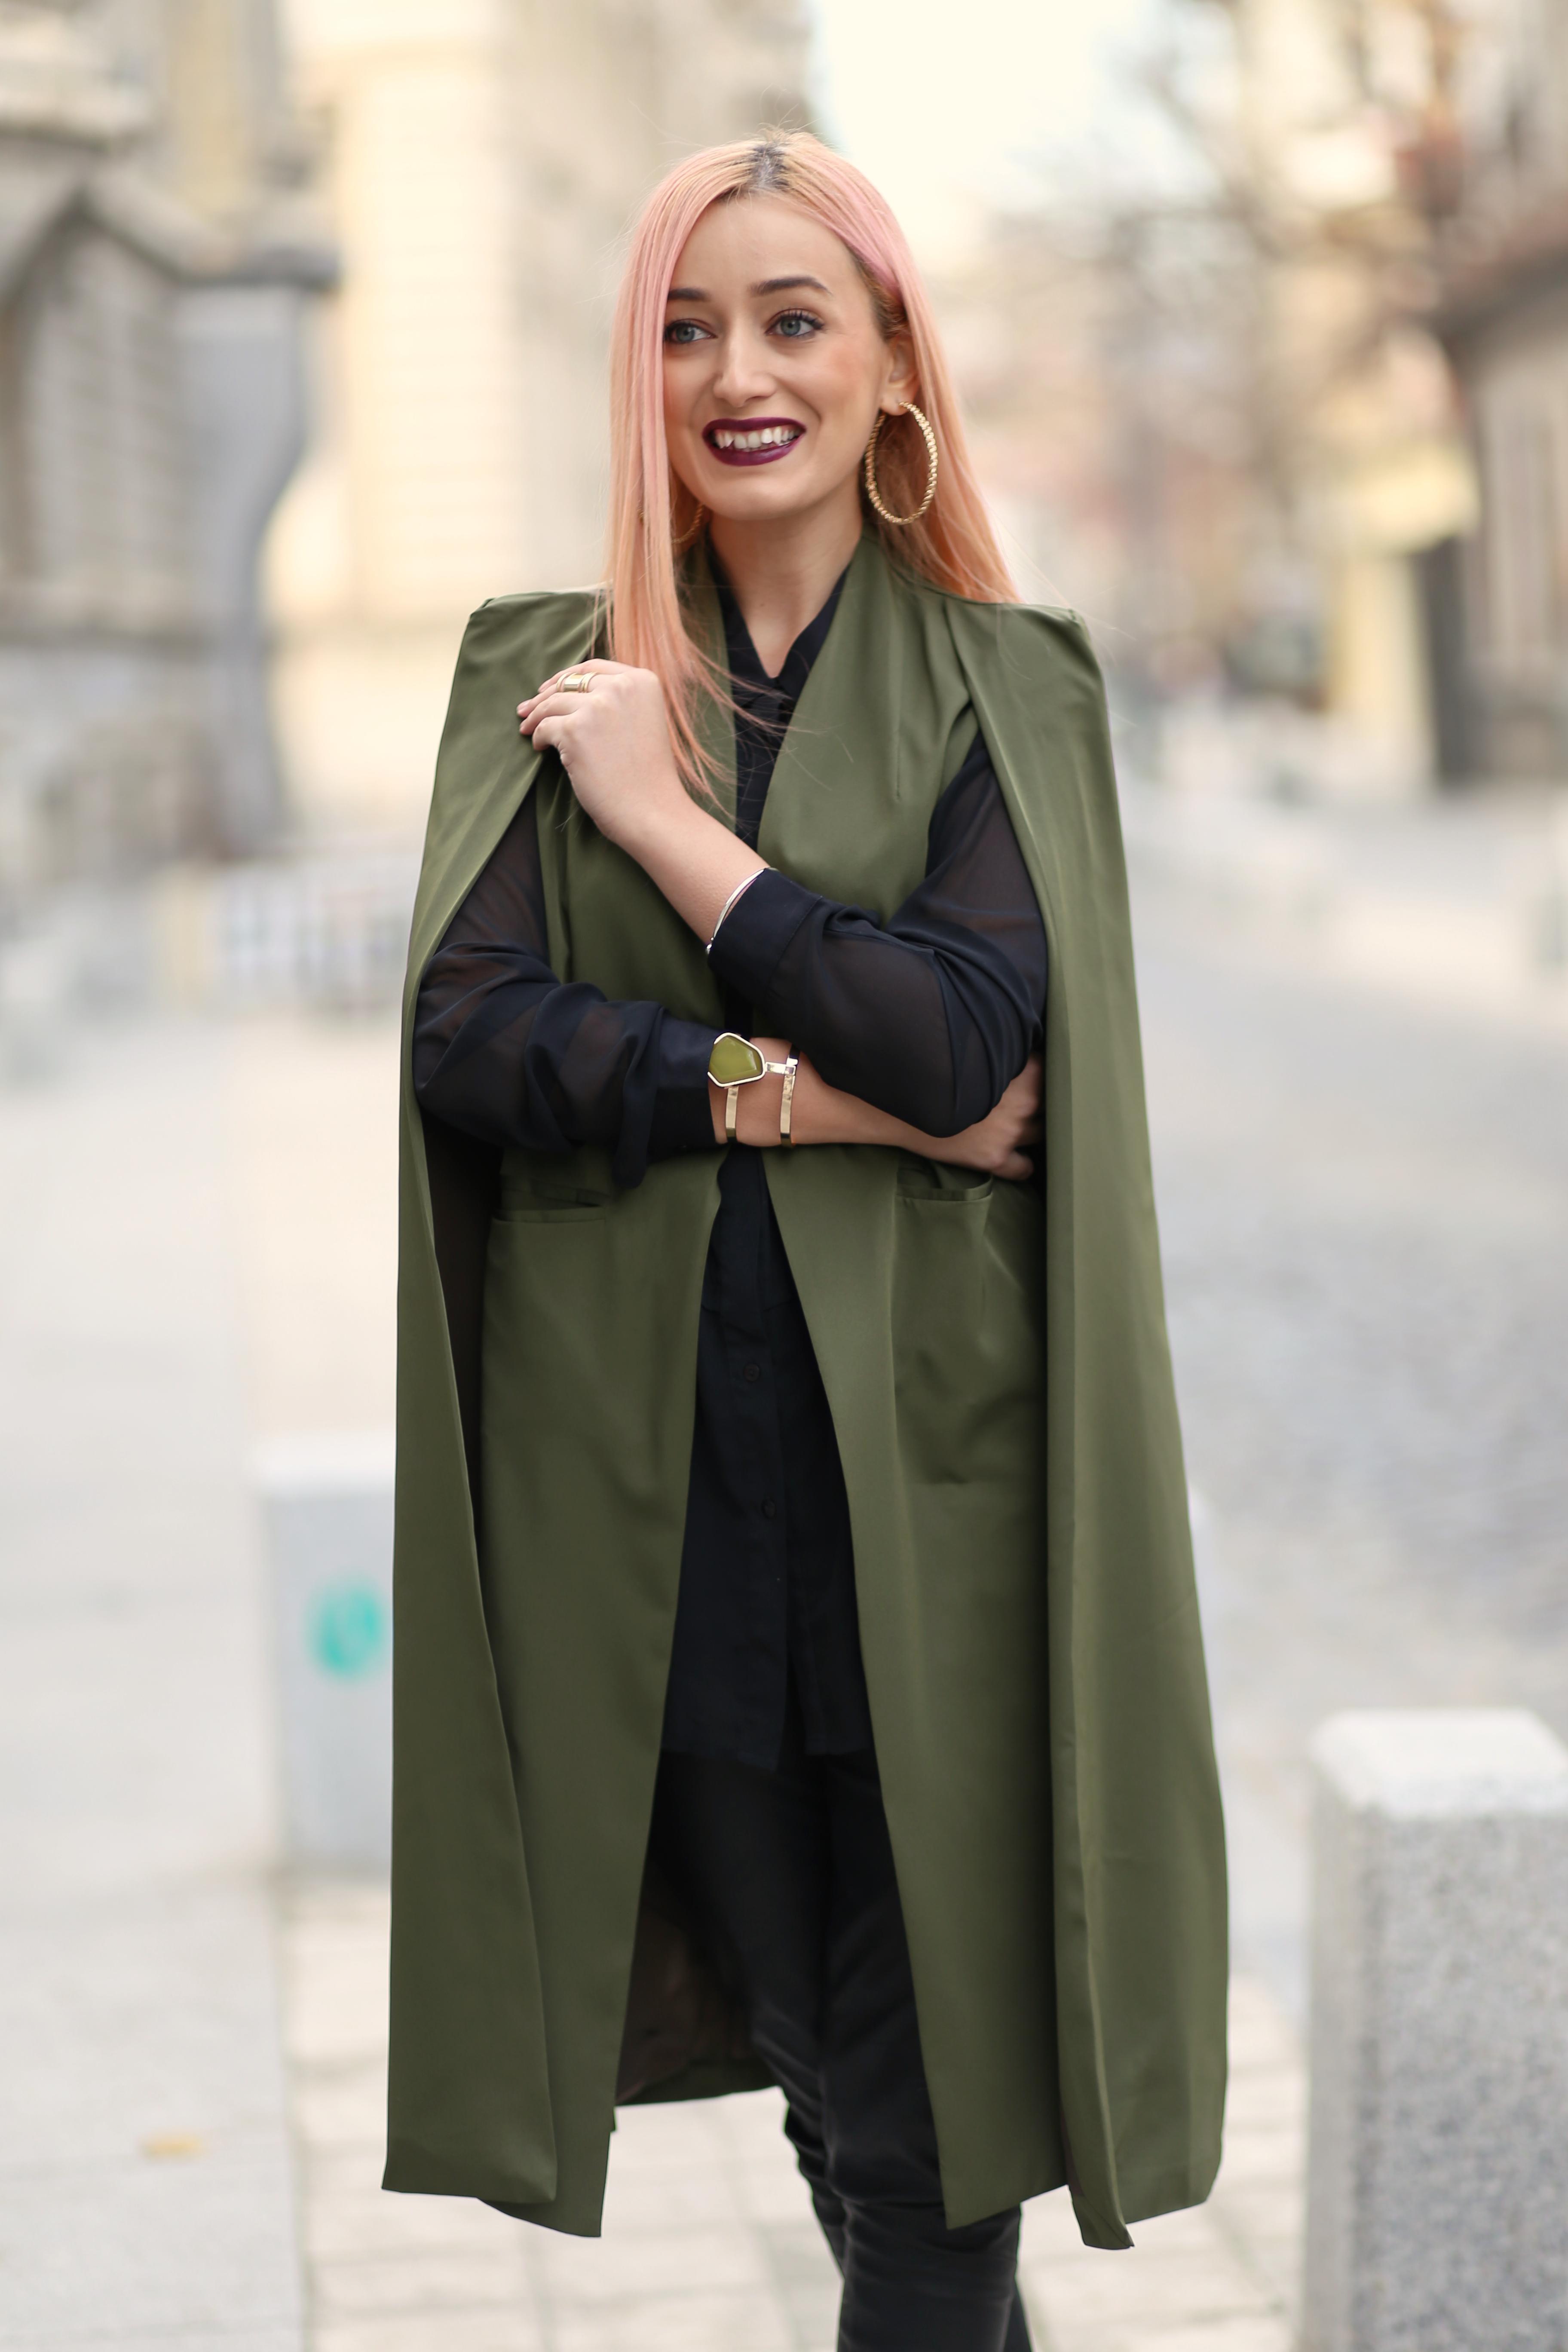 madalina misu, cum mixam stilurile, influente militare, anii 70, cum purtam capa, trenduri toamna-iarna 2016 2016, yoins capes, yoins review, ateneul roman, blog moda, fashion blog, fashion tips, signature bymm, signature by m&m